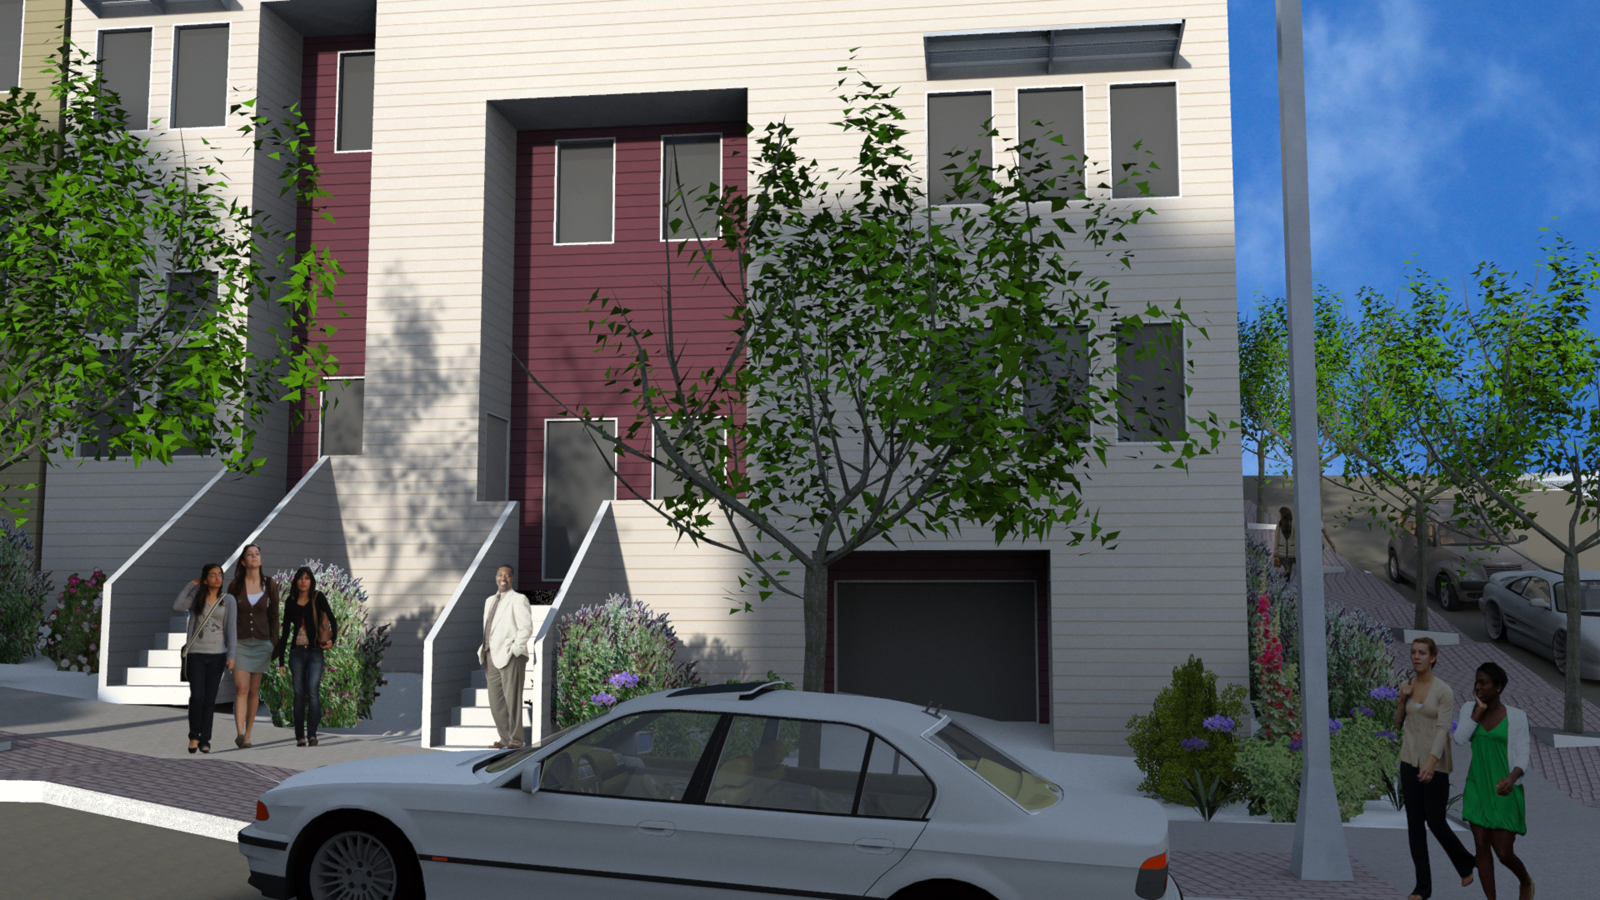 201403 8-10-15 Block 8 View From Ironwood at Catalina at building entries.jpg